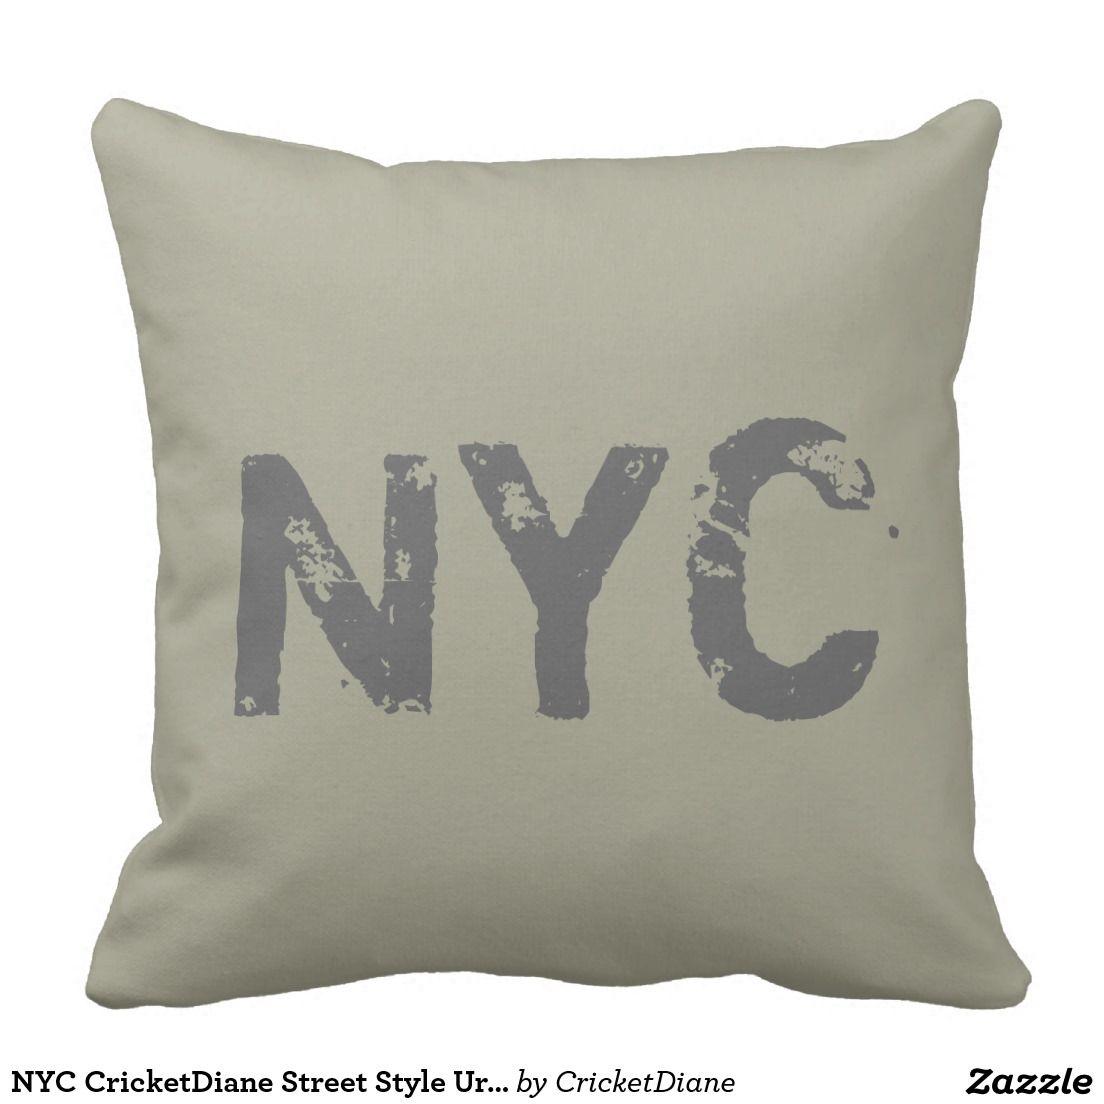 NYC CricketDiane Street Style Urban Graffiti Olive Throw Pillow ...